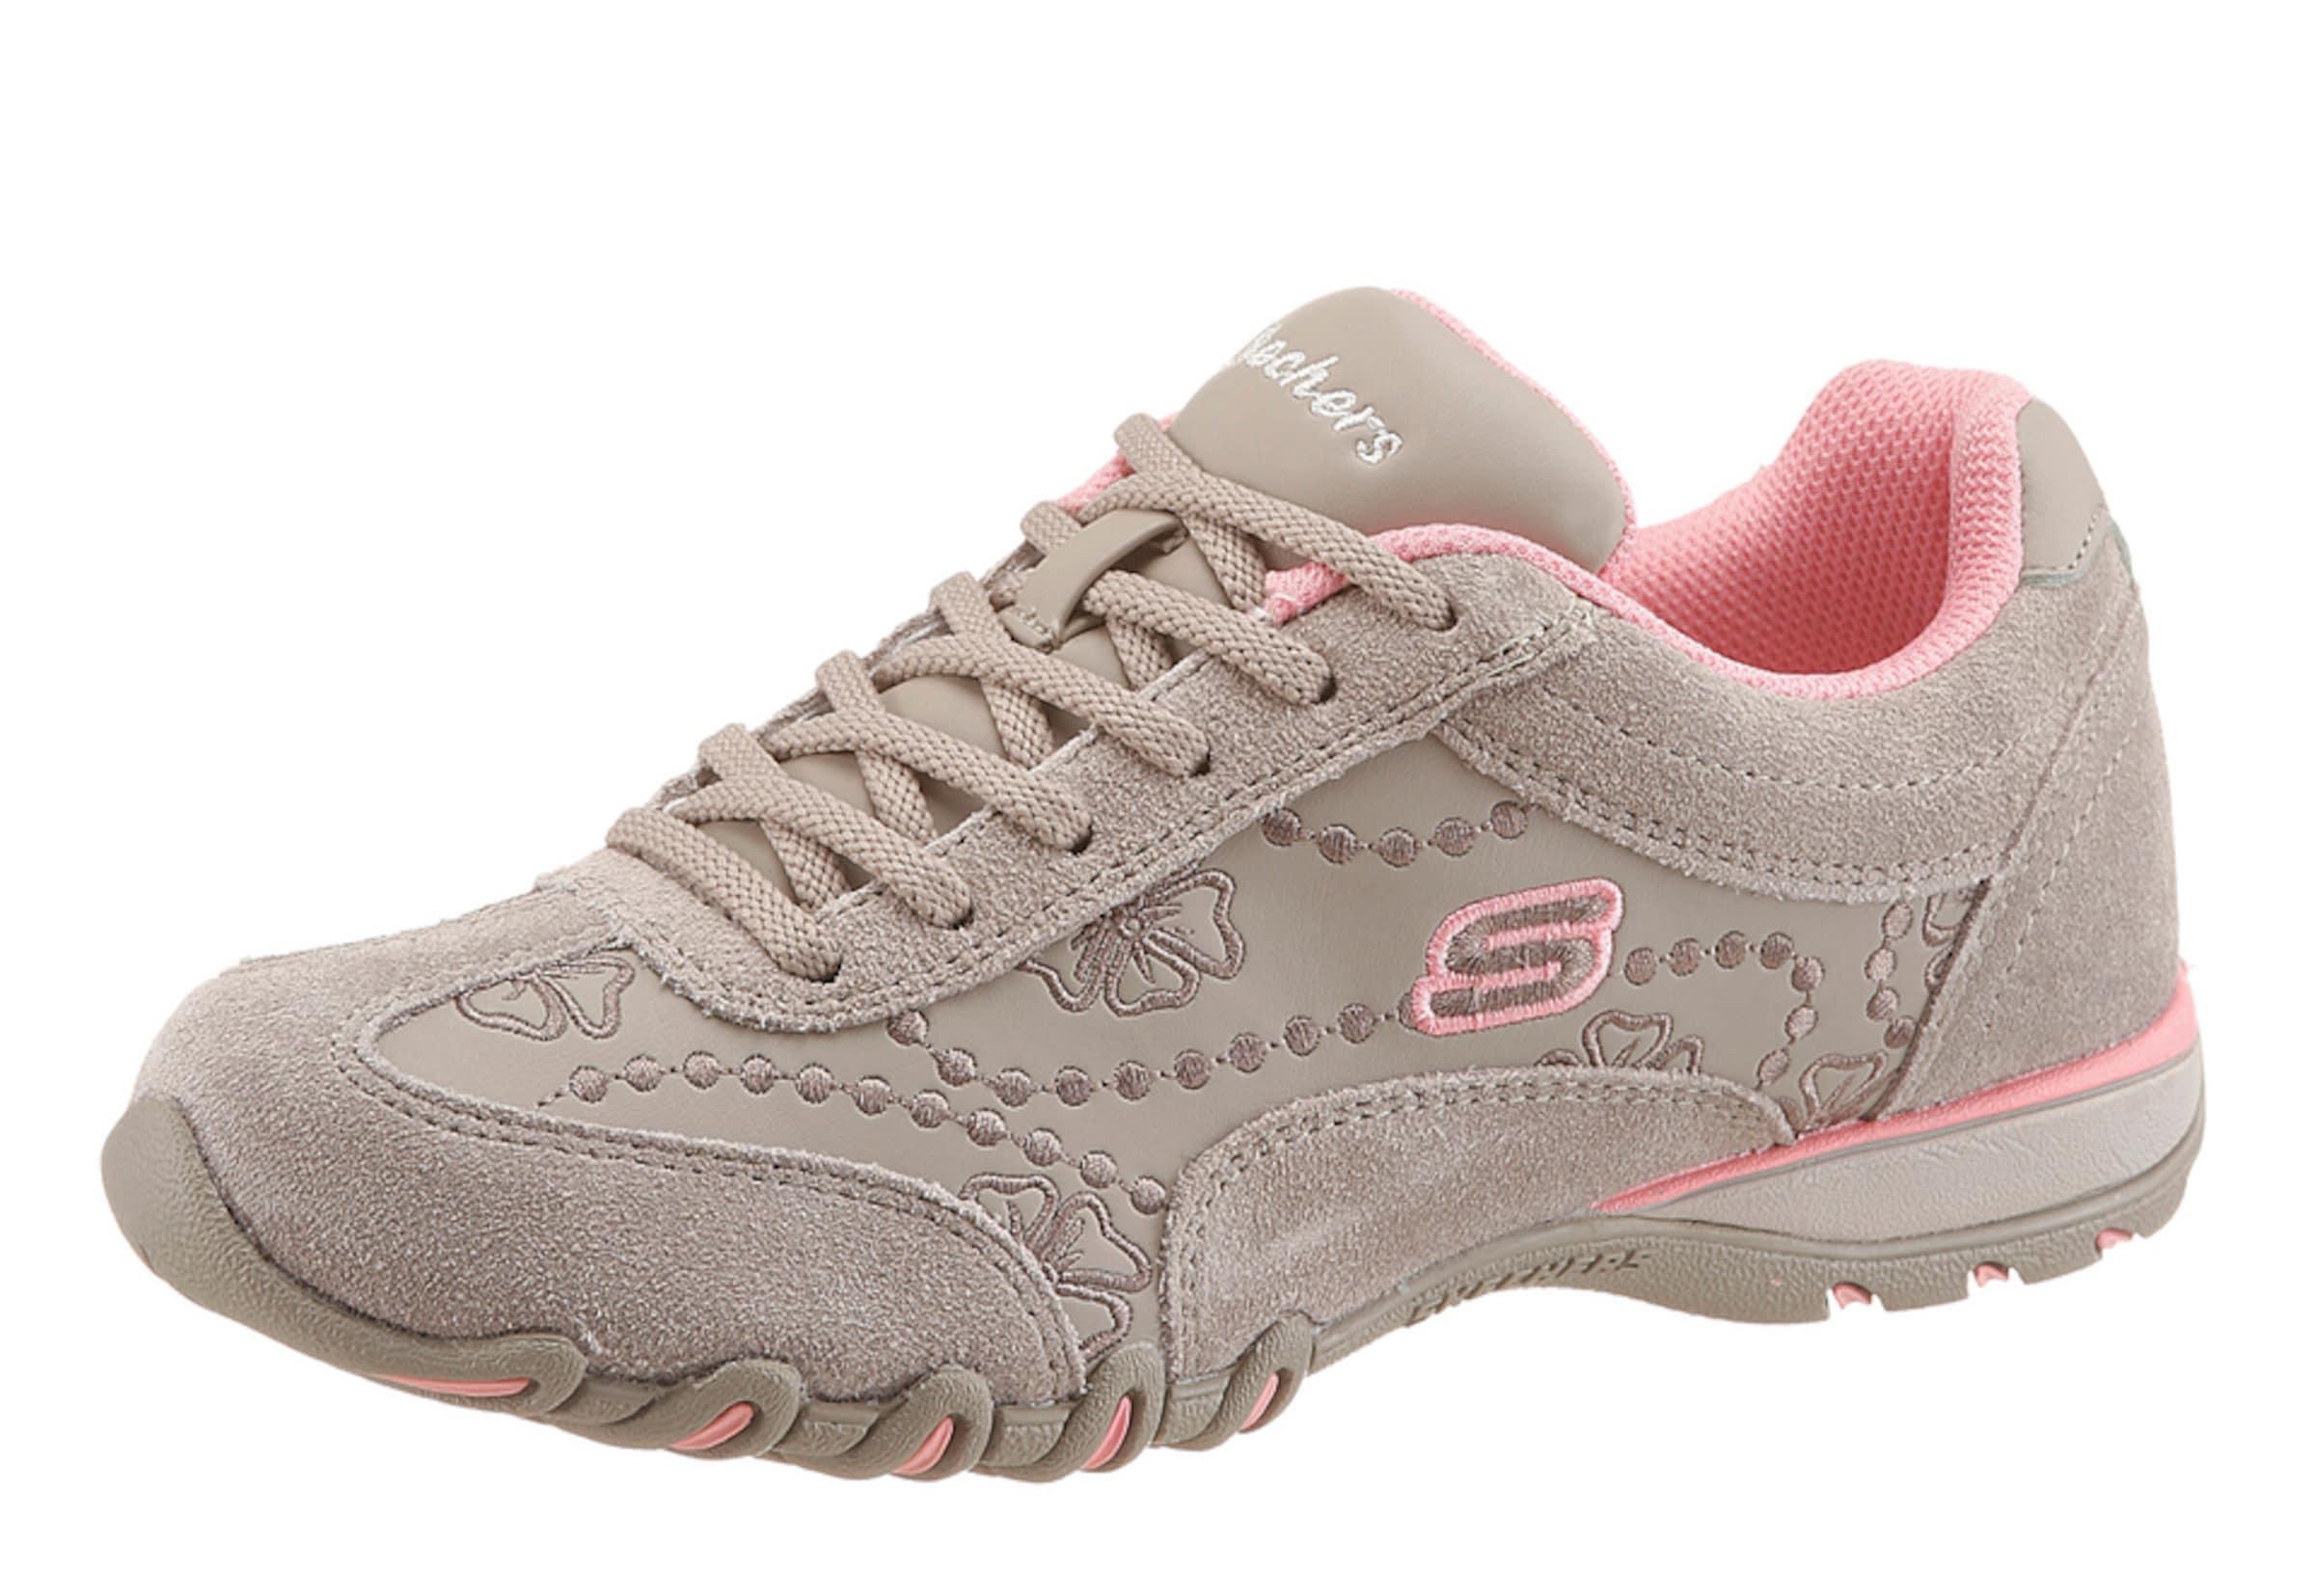 SKECHERS Speedsters Sneakers Günstige und langlebige Schuhe